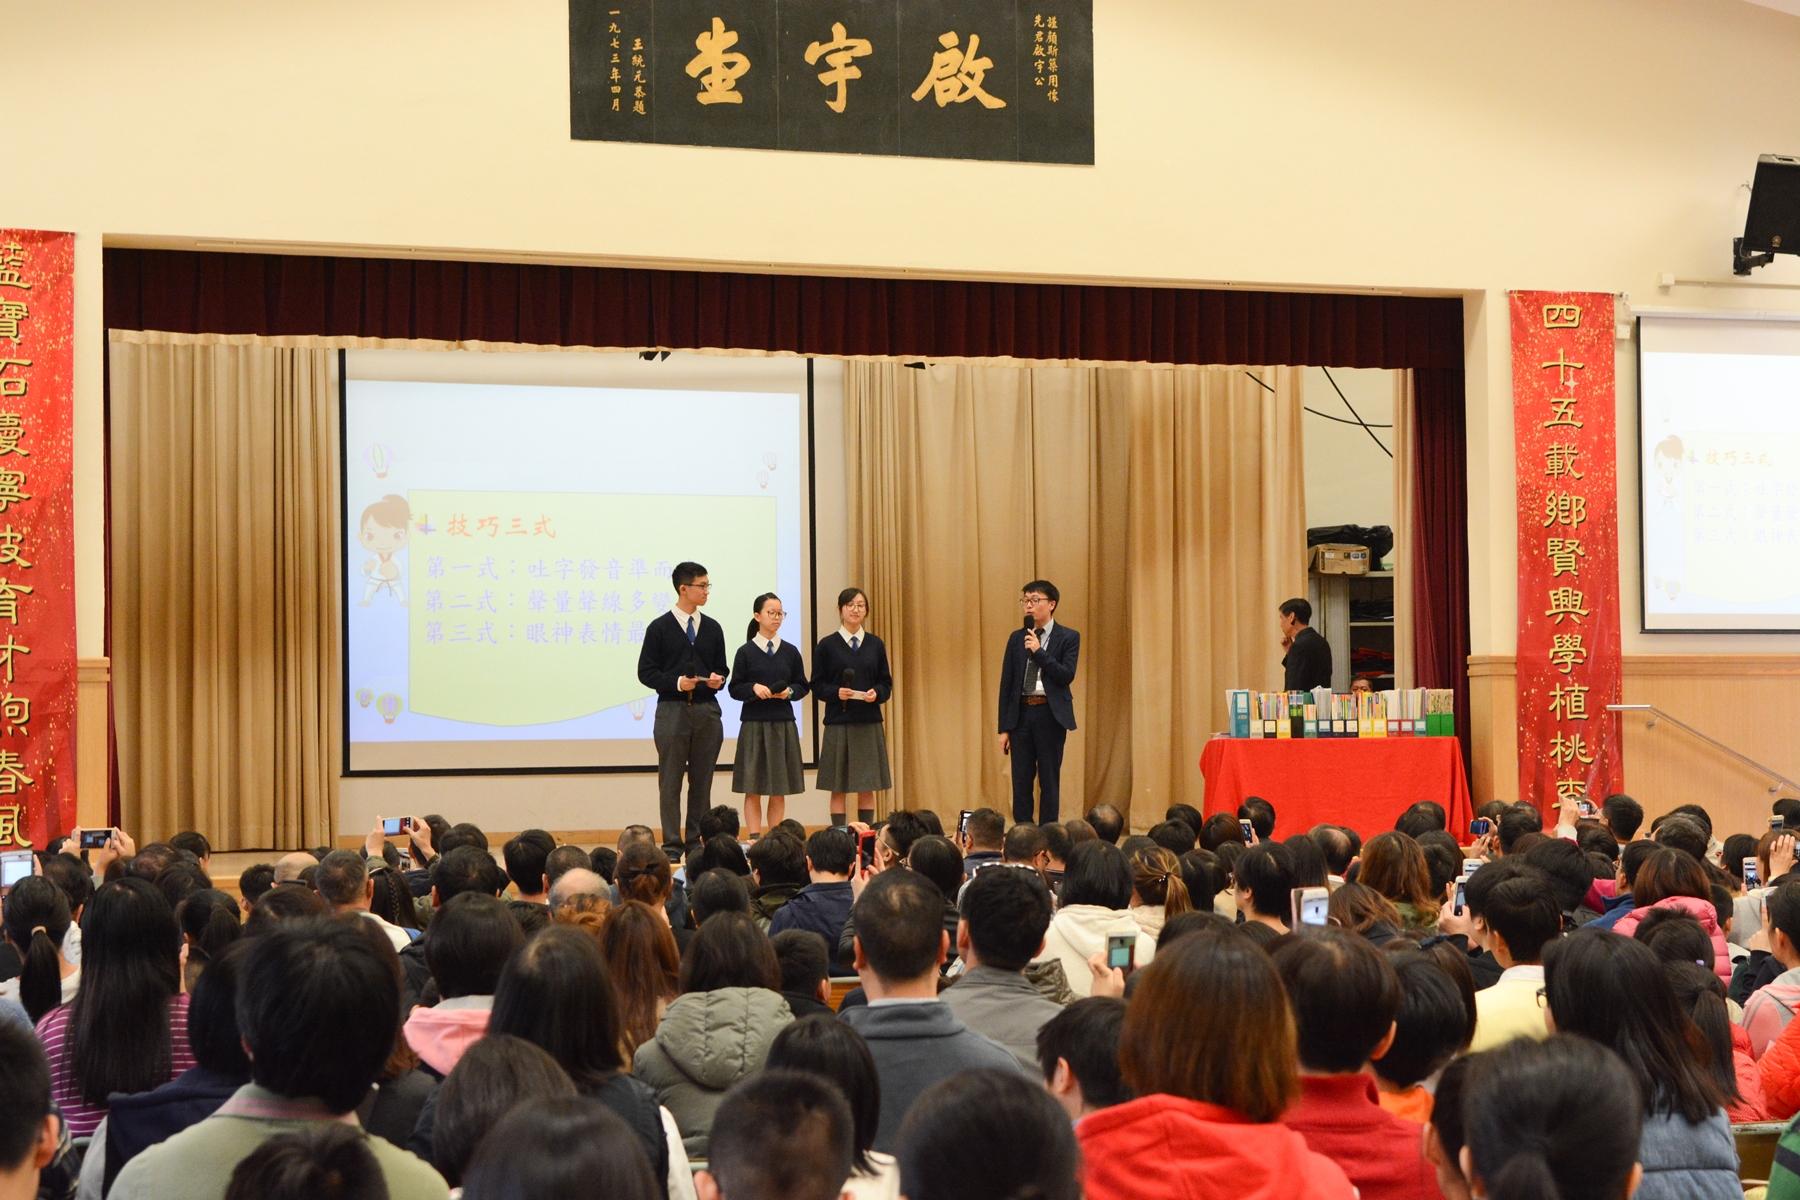 http://www.npc.edu.hk/sites/default/files/13_128.jpg